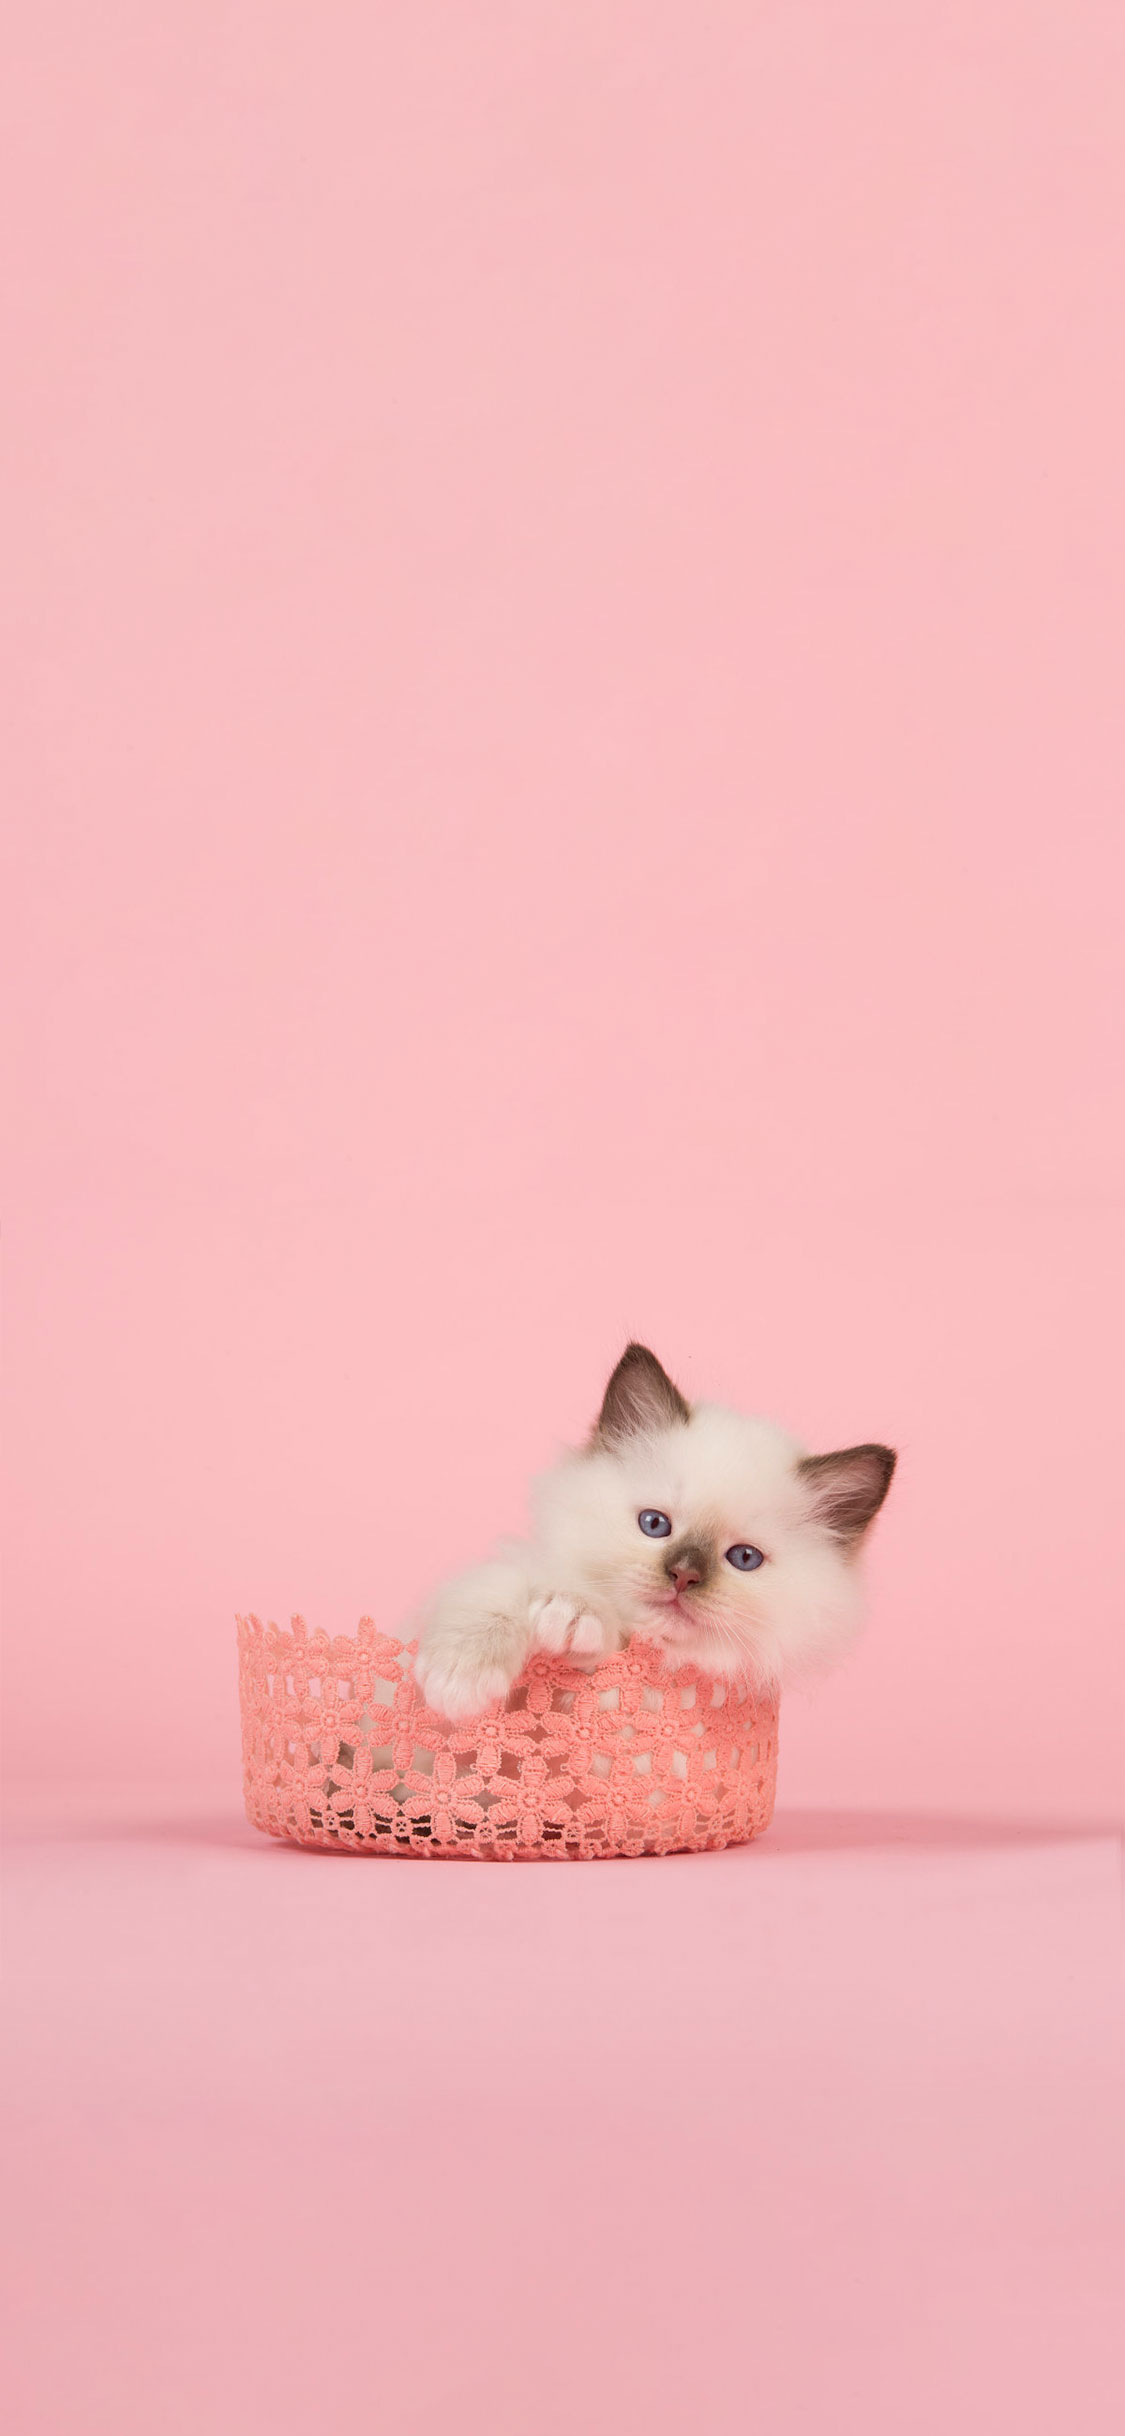 Cat Pink Cat Wallpaper Iphone 1125x2436 Wallpaper Teahub Io